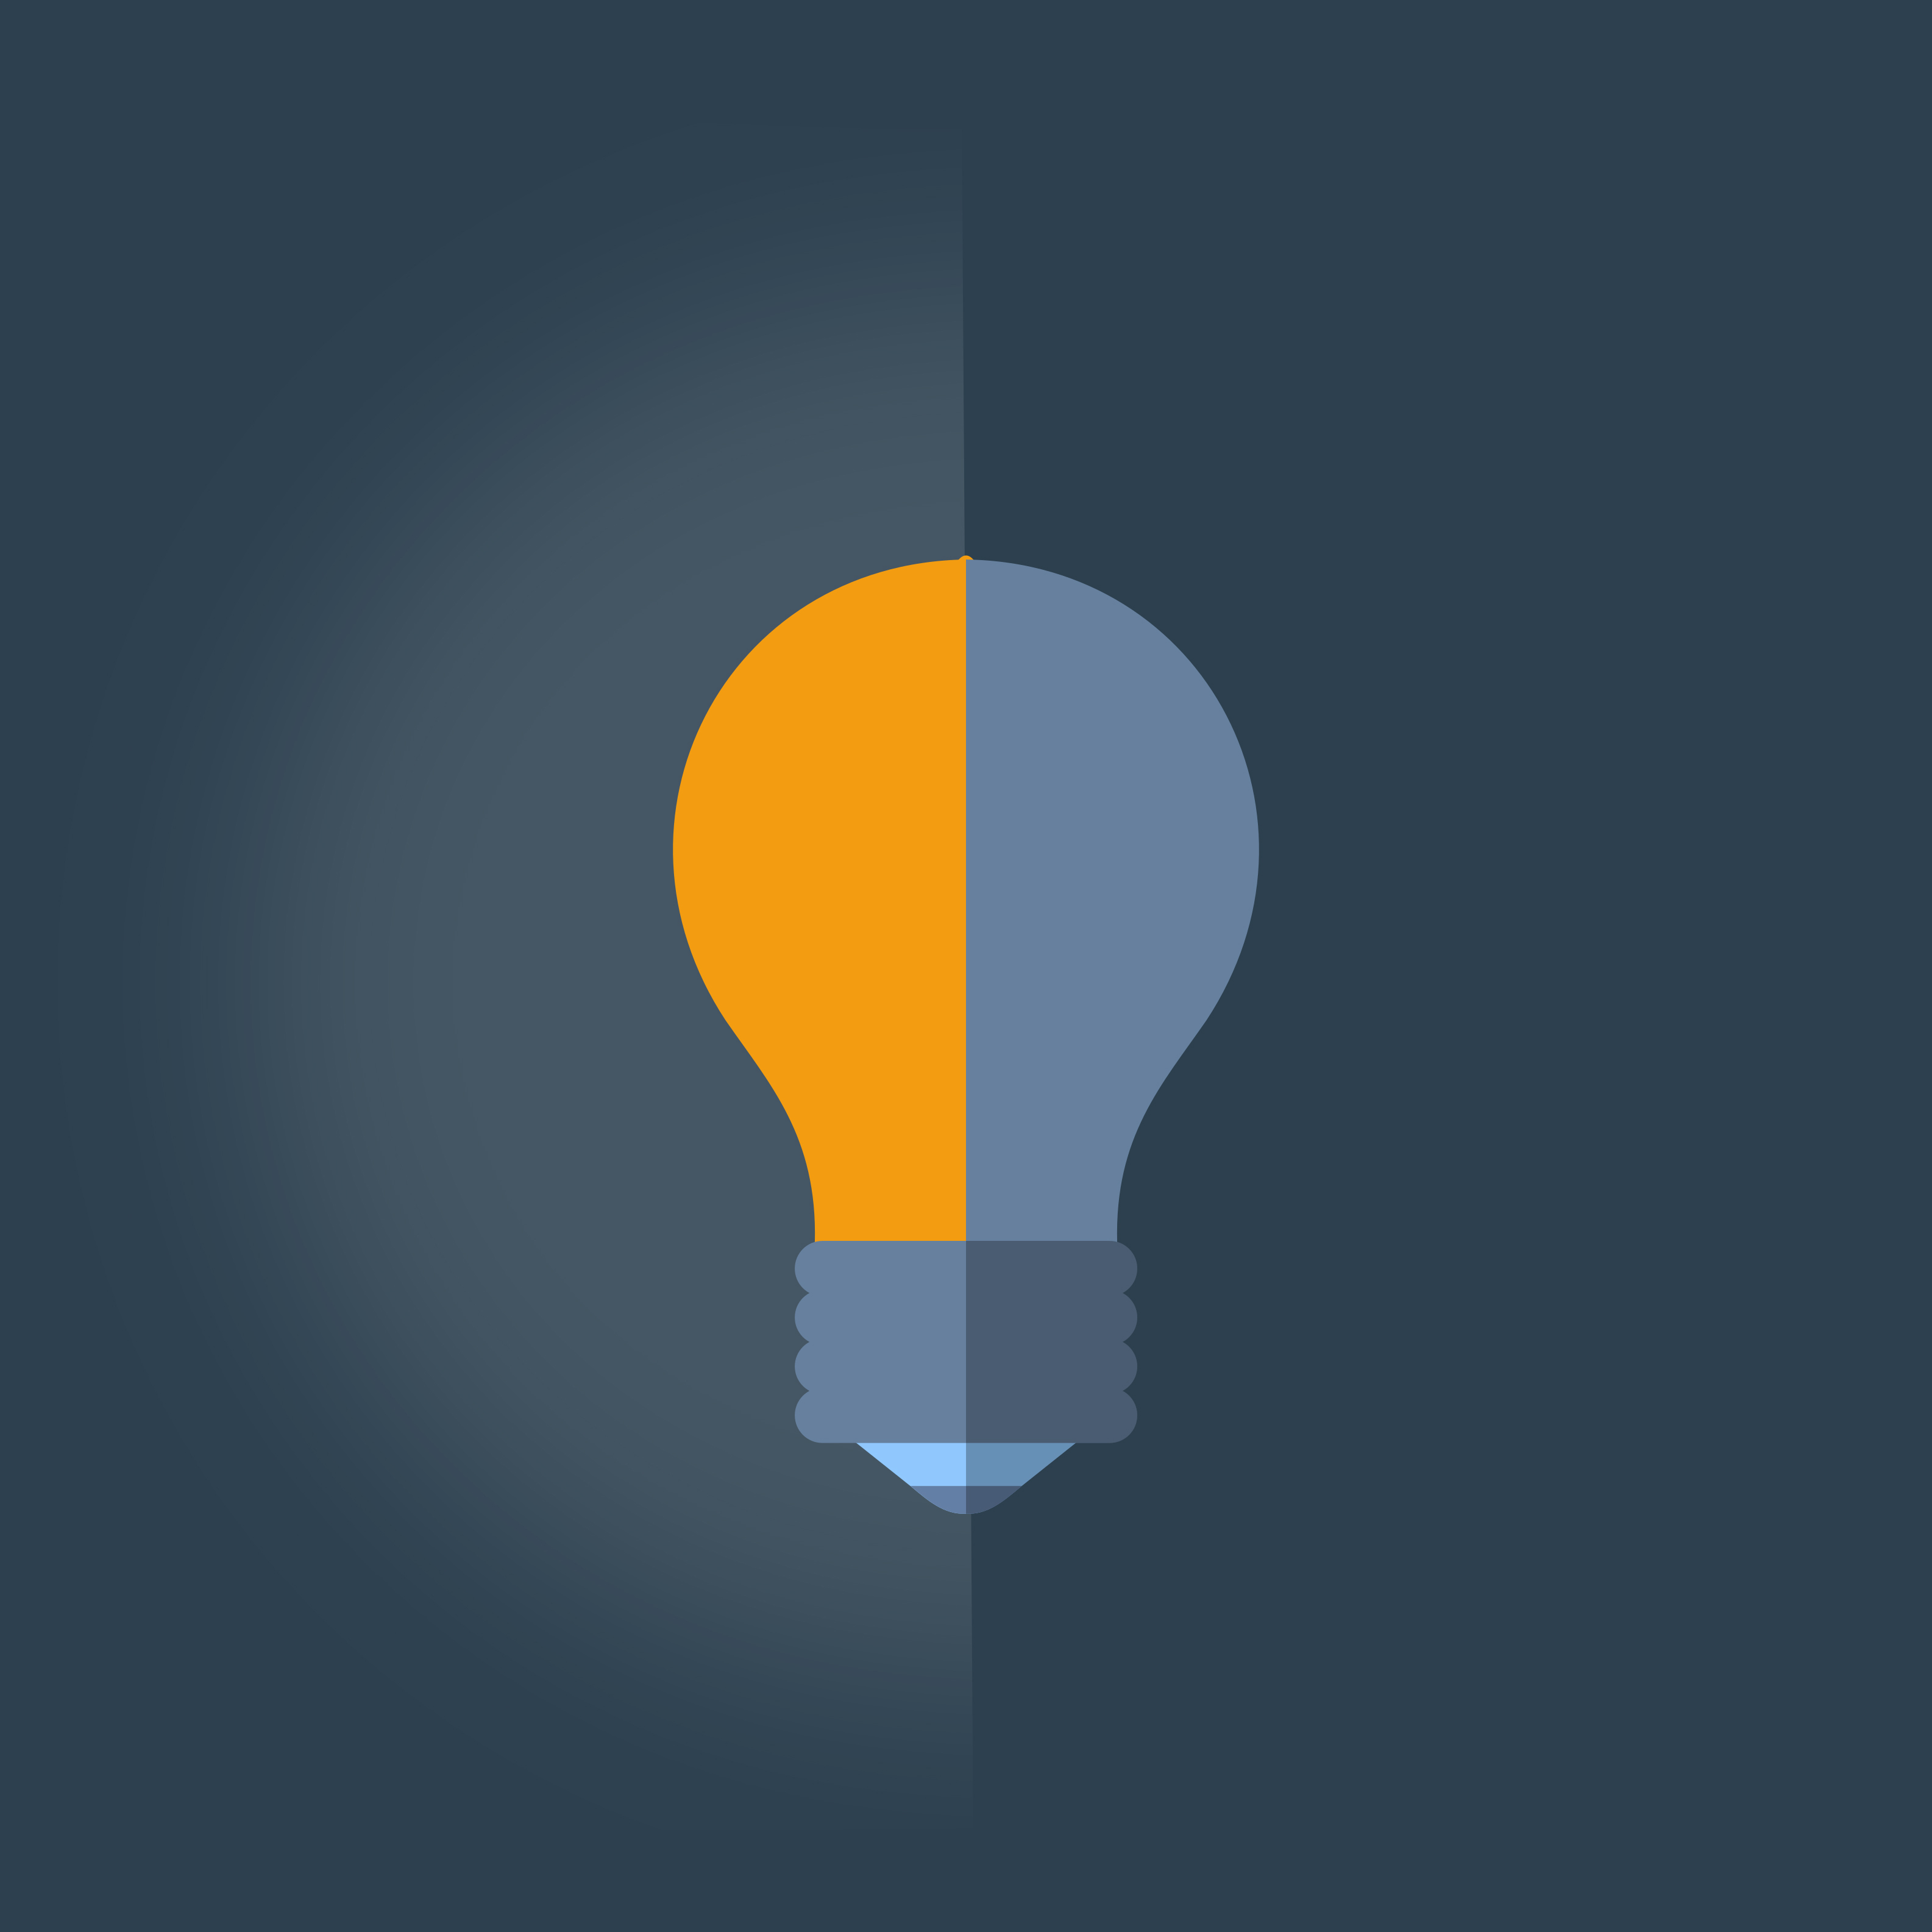 Half Light - Half Lighted Lightbulb, App, Lightbulb, Organizer, Networking, HQ Photo